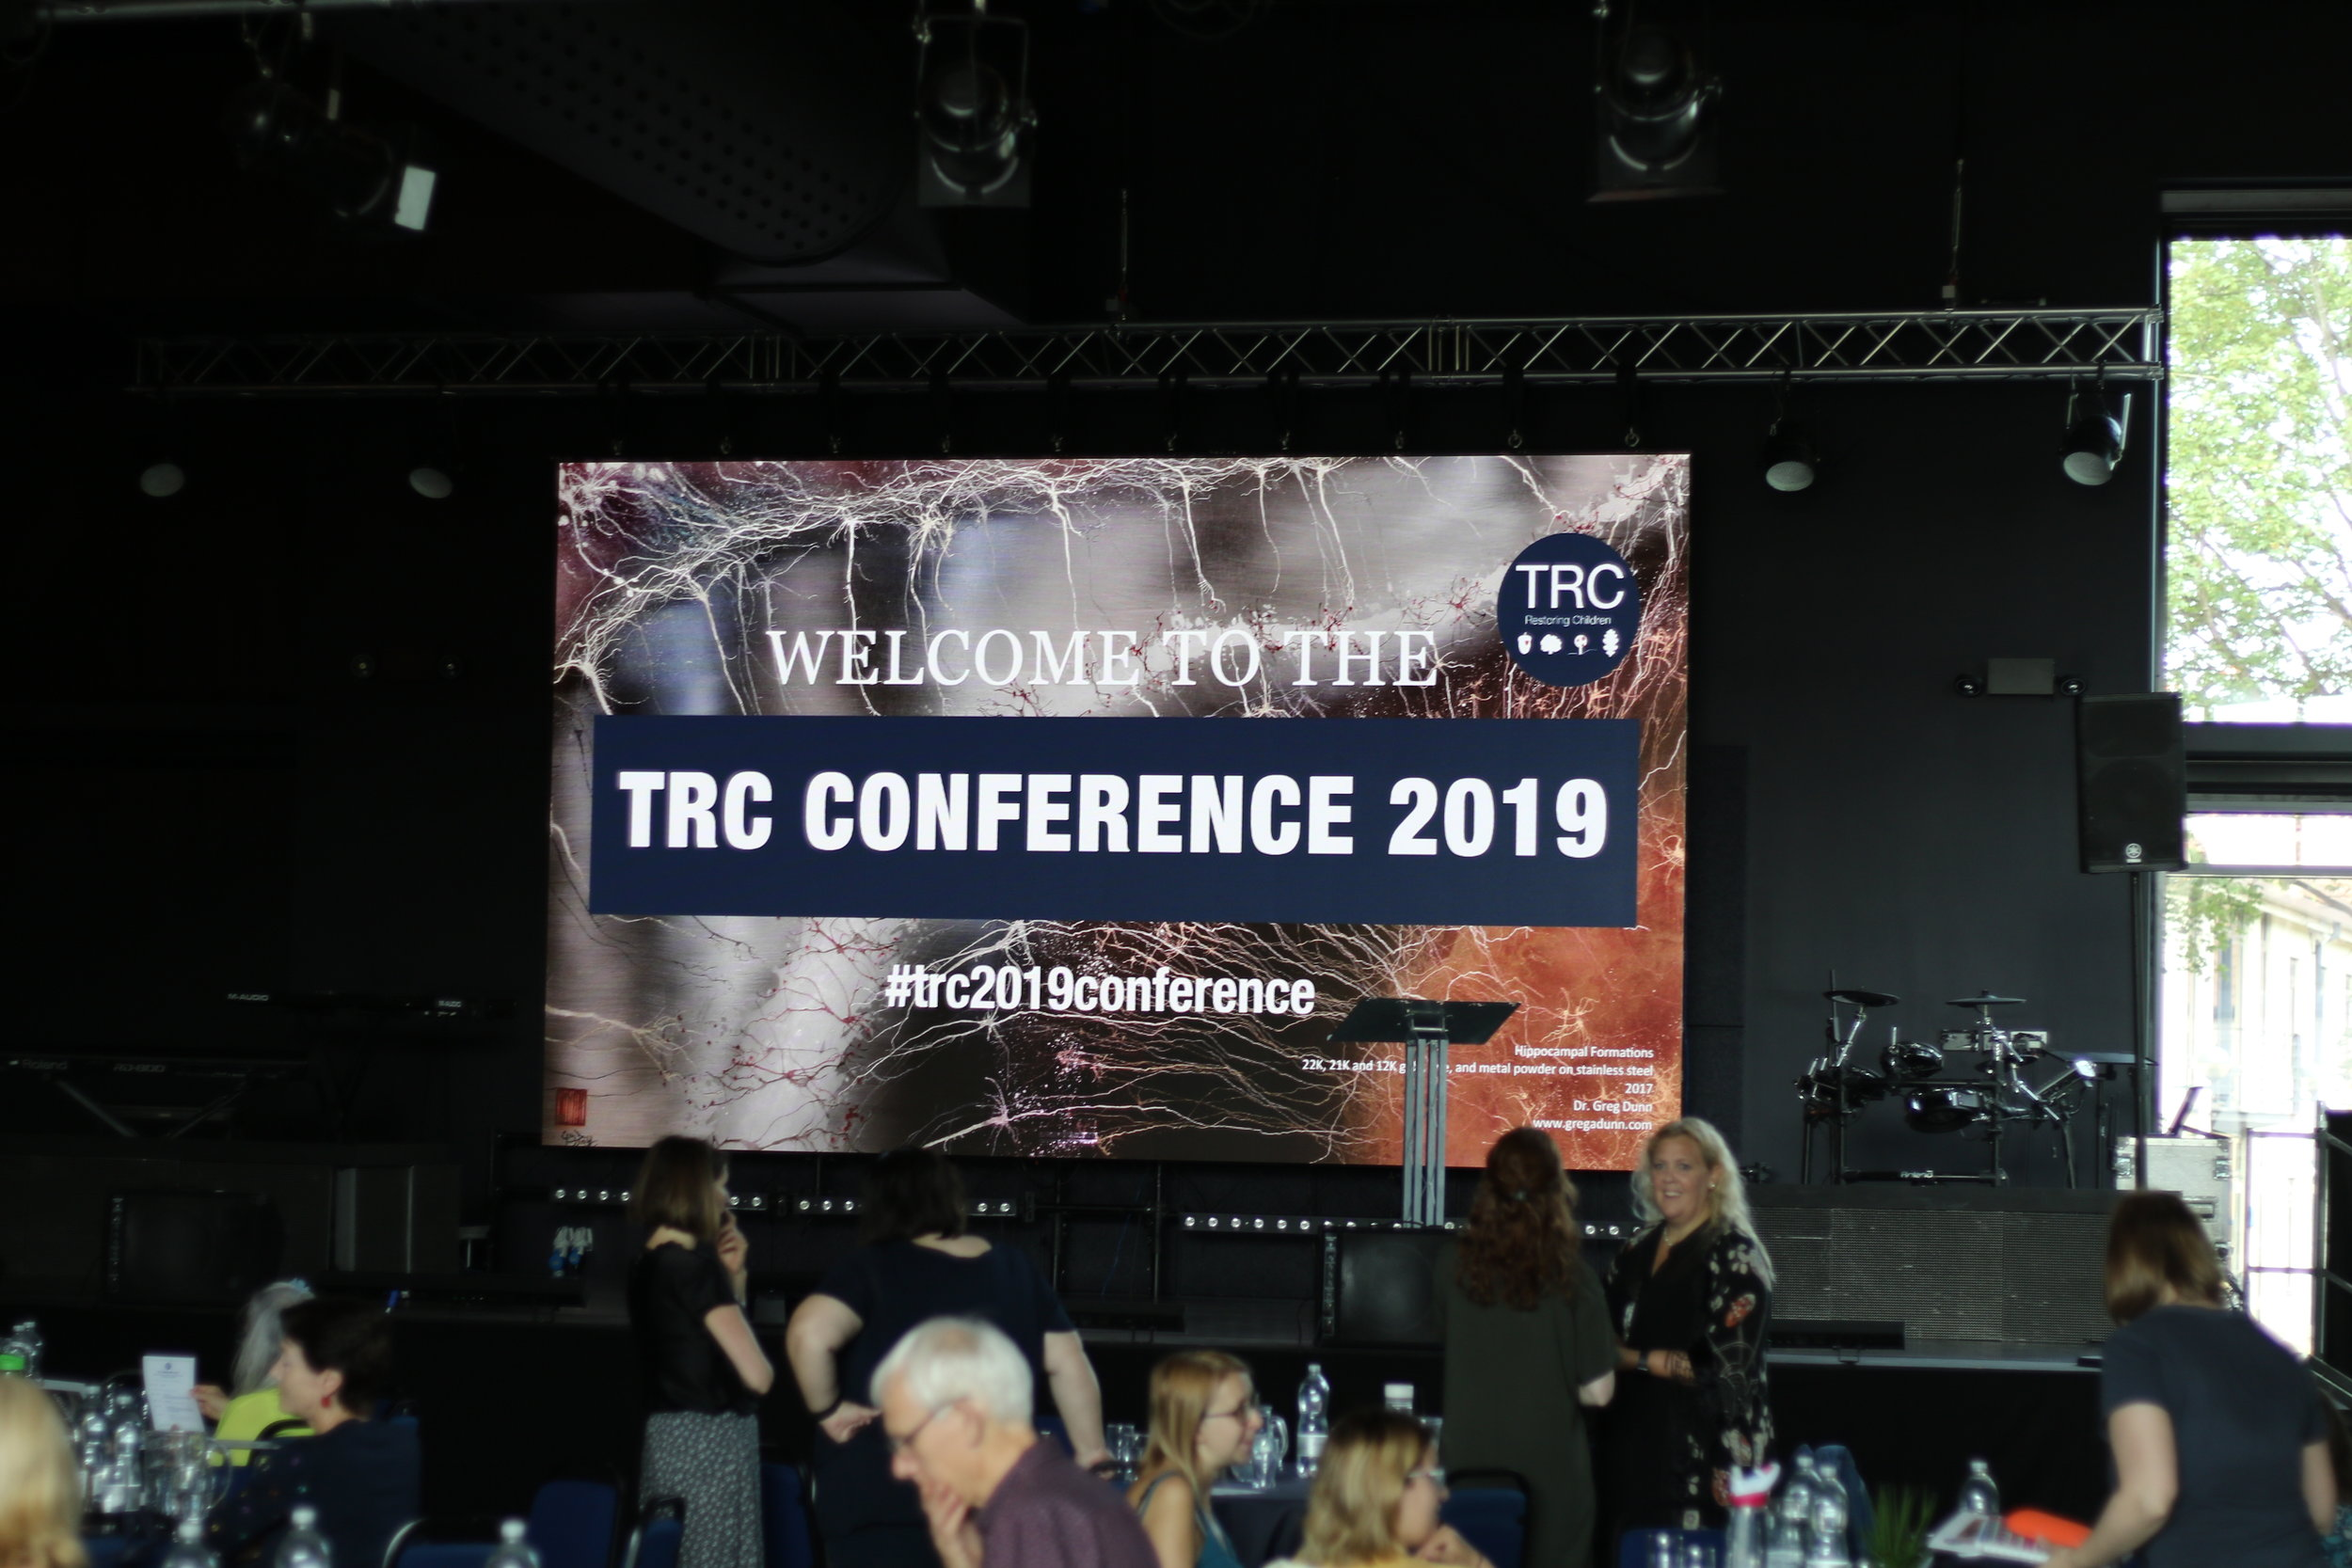 TRC_conference_2019.JPG